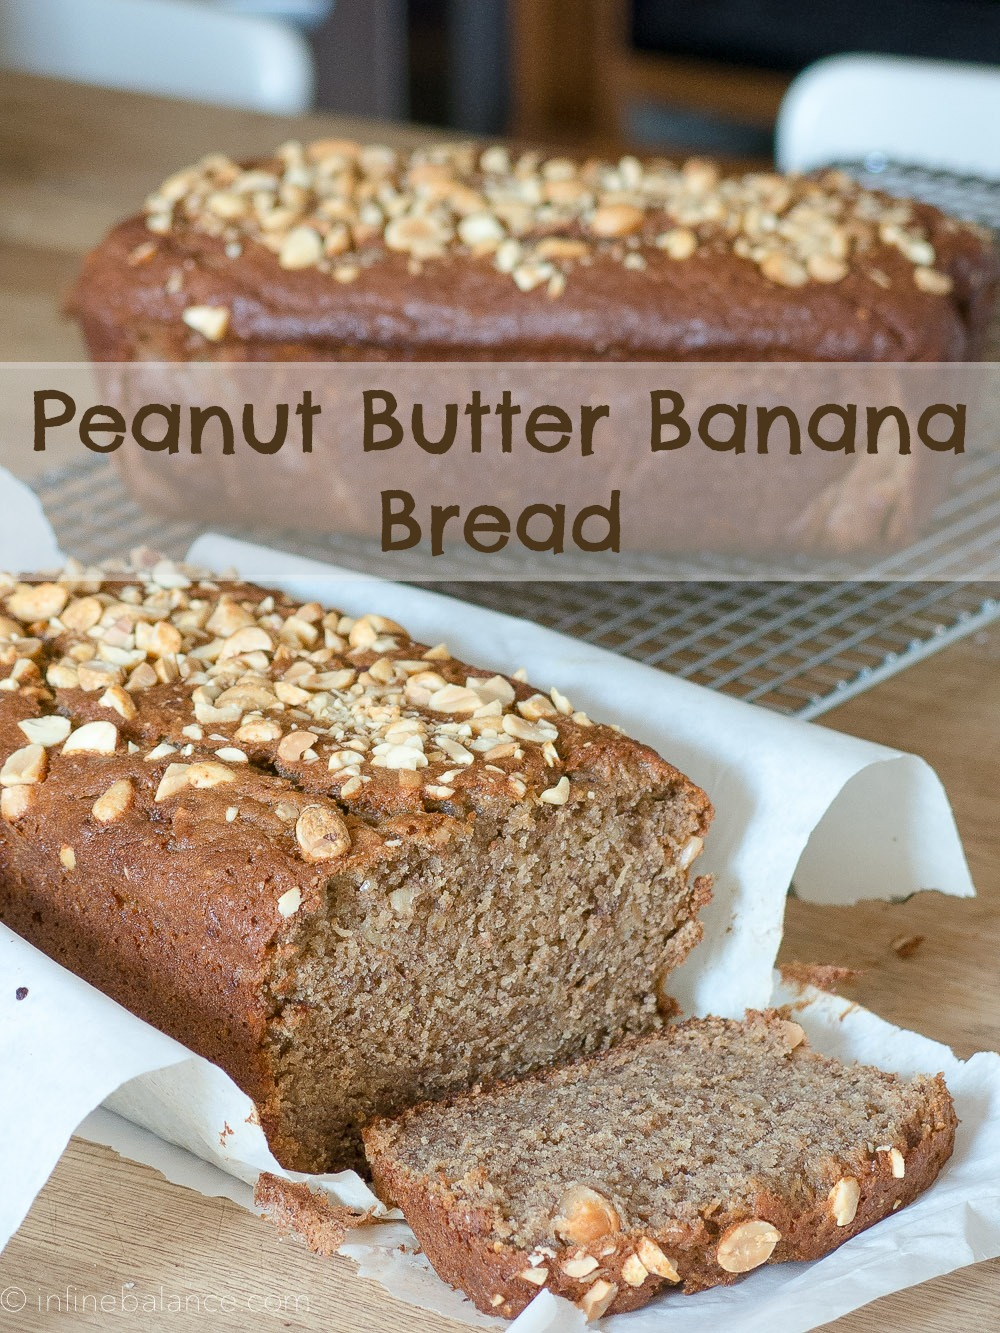 Peanut Butter Banana Bread | www.infinebalance.com #baking